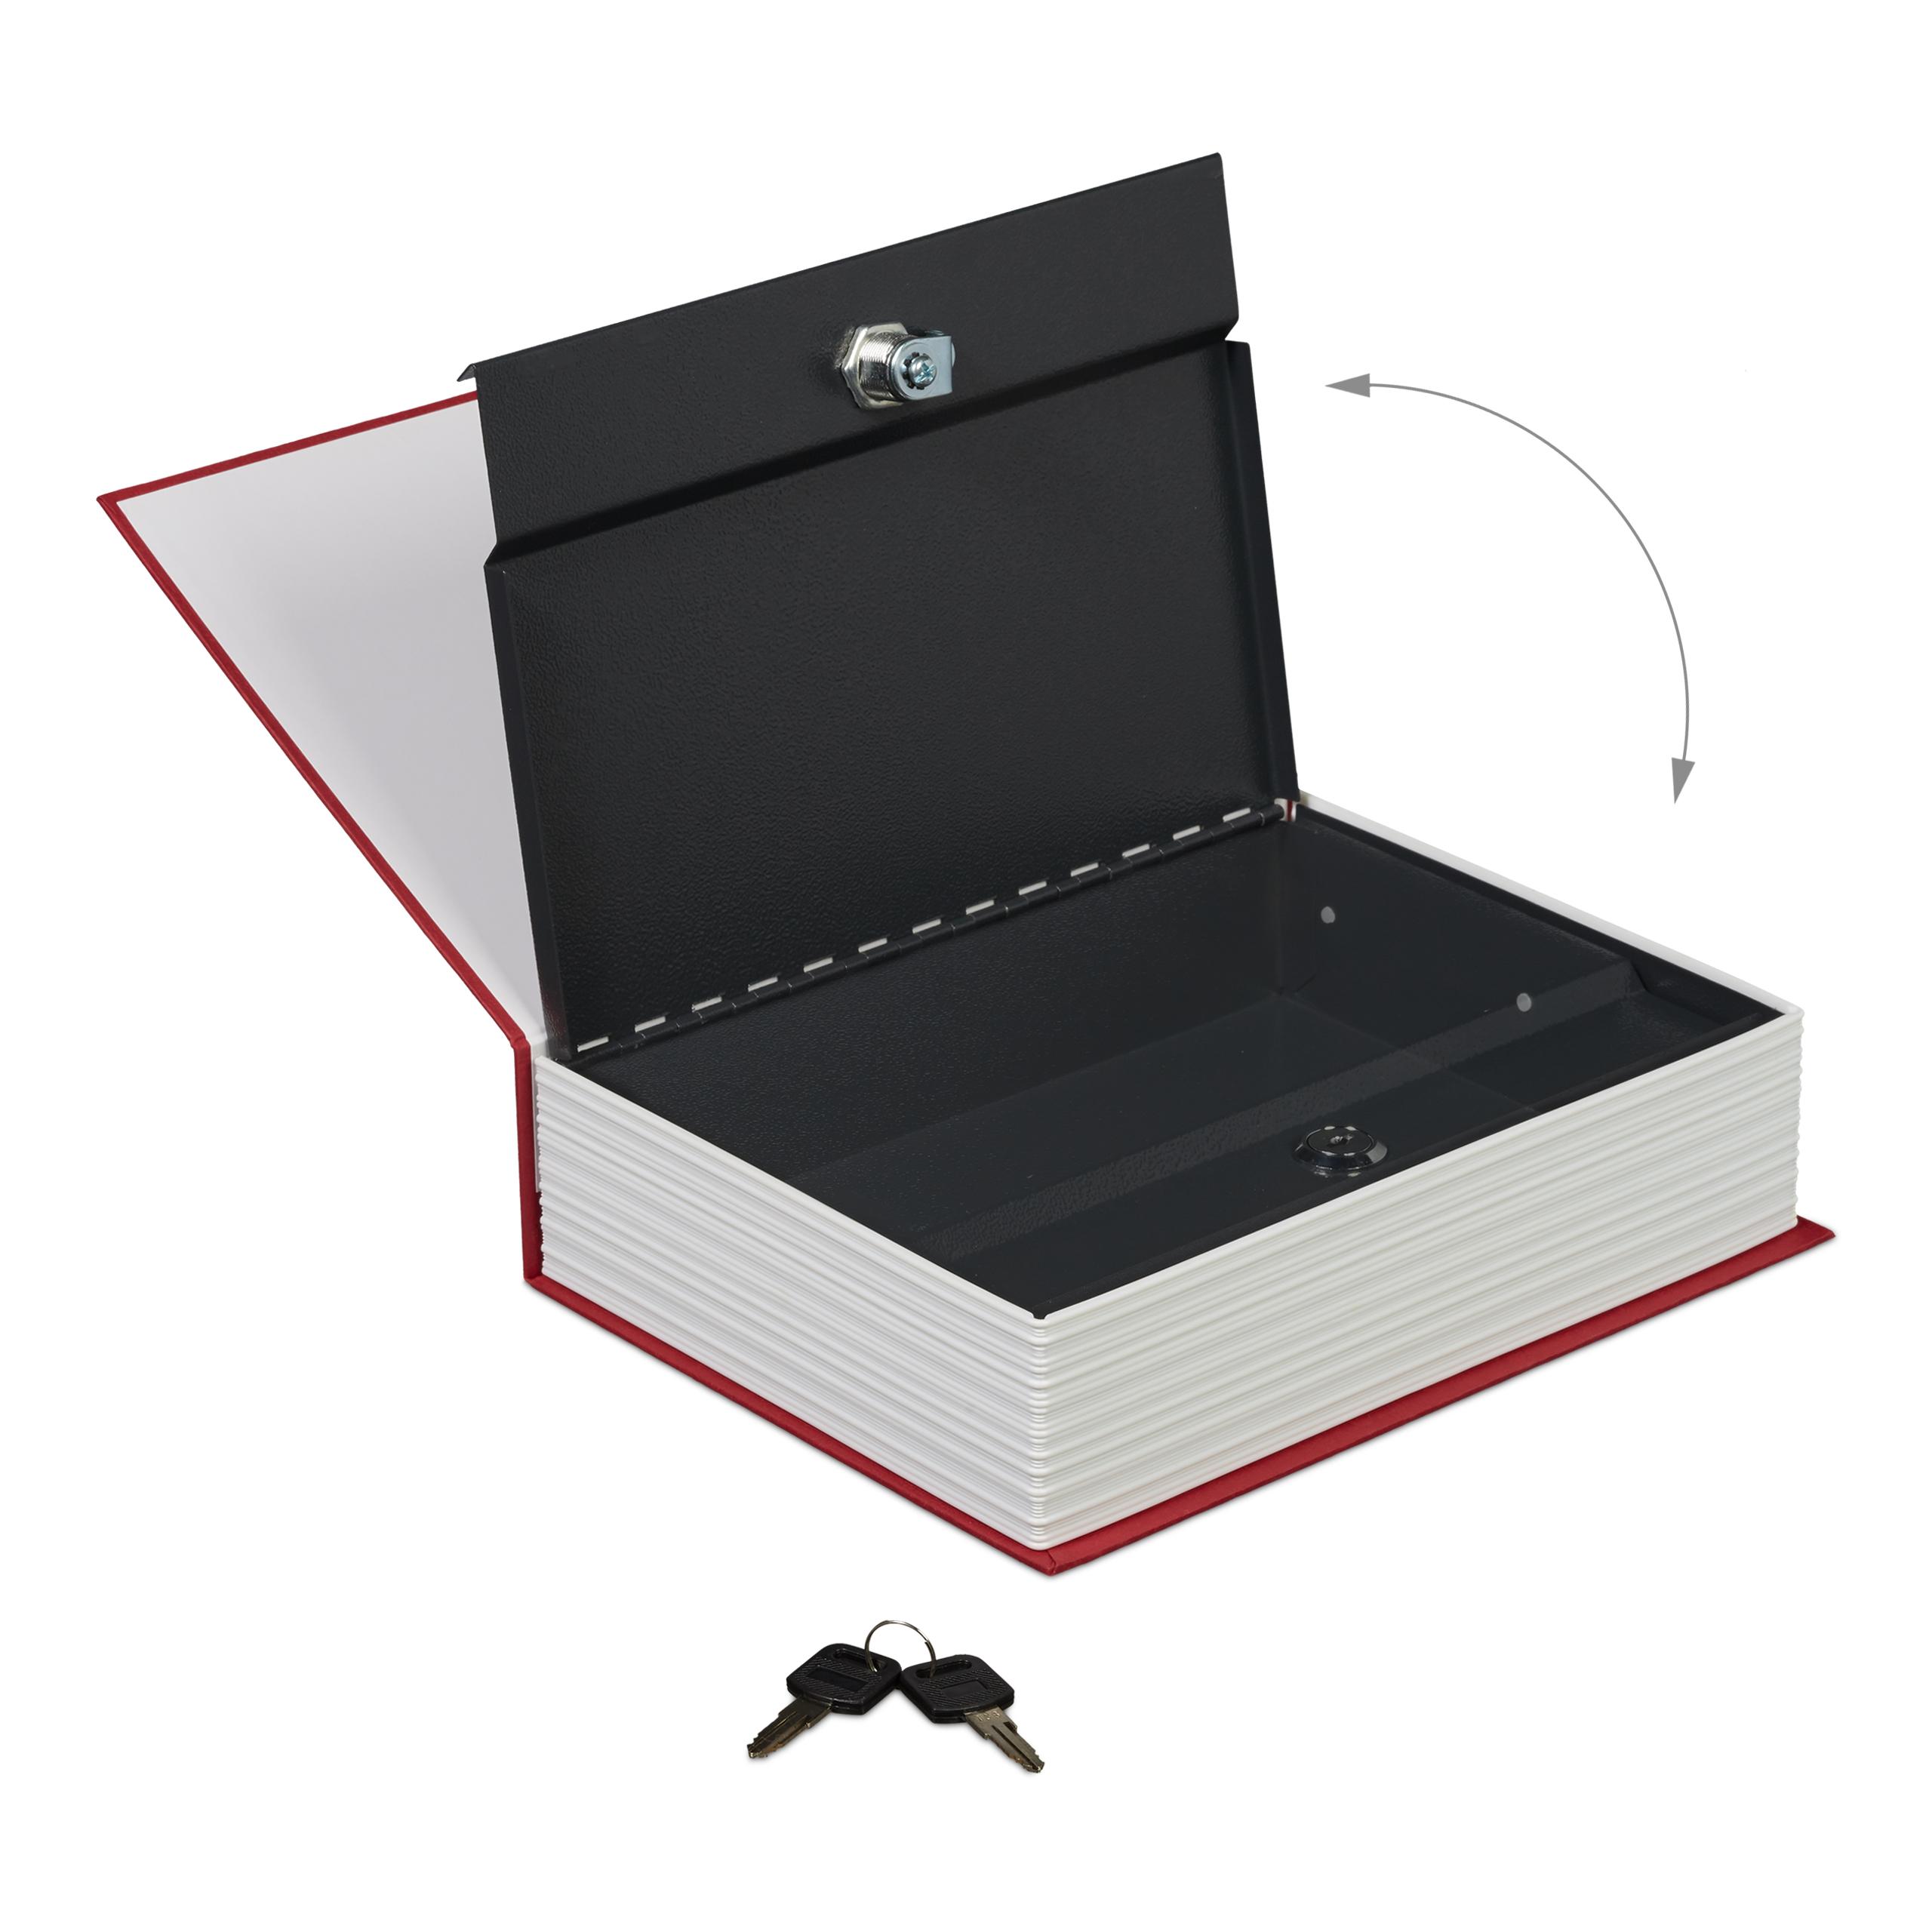 Buchtresor groß verschließbar 2 Schlüssel Stahlkassette Englisch Wörterbuch Safe